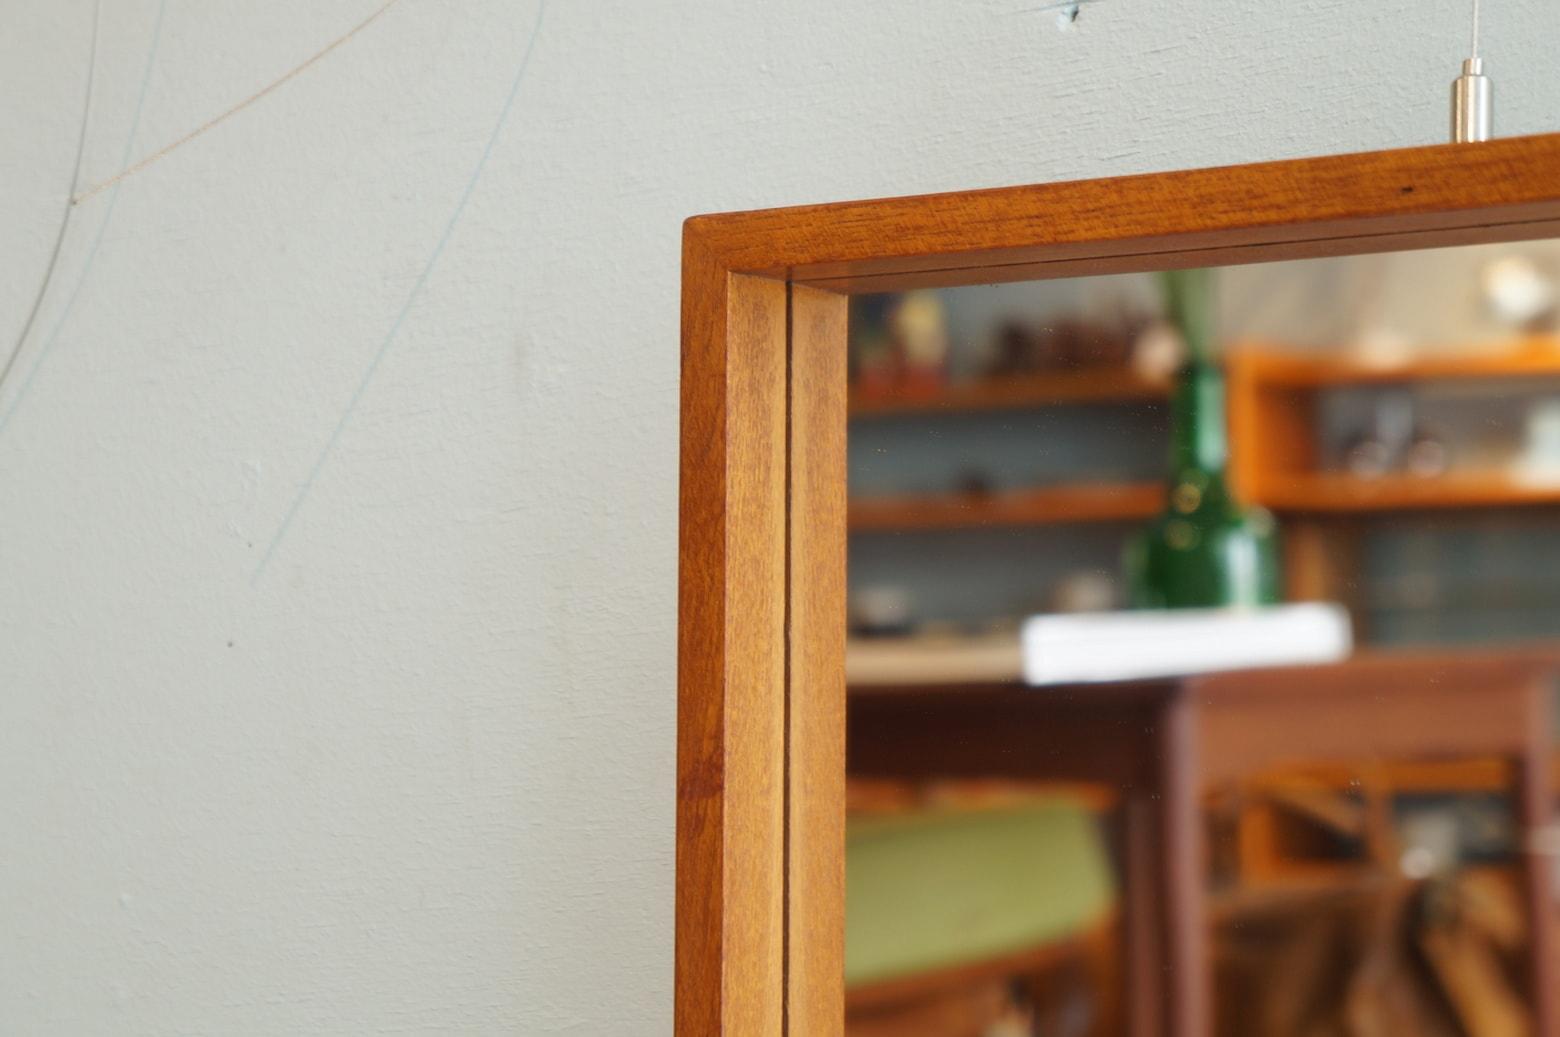 Danish Vintage Teak Wood Wall Mirror/デンマーク ヴィンテージ チーク材 ウォールミラー